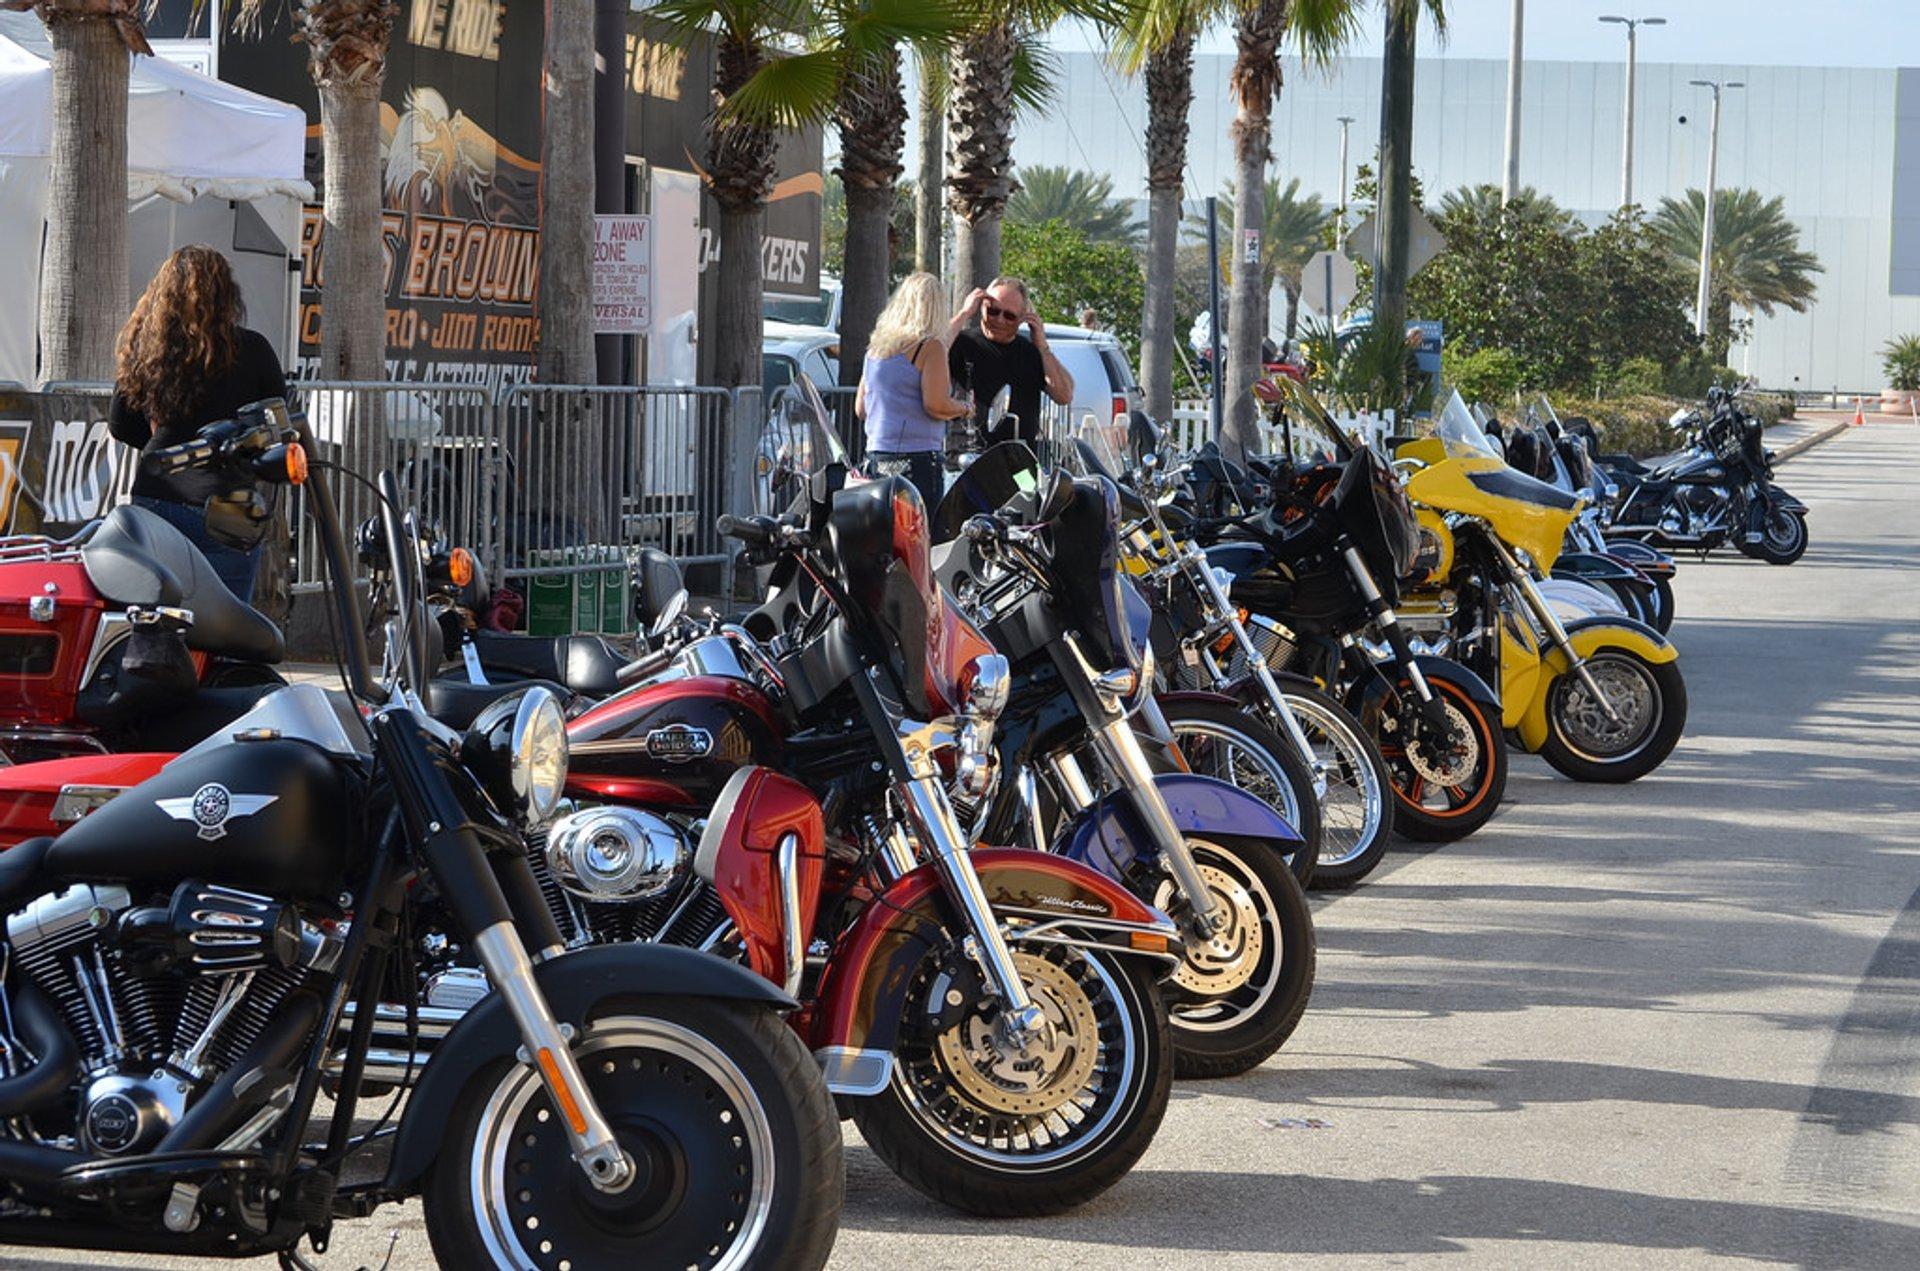 Daytona Beach Bike Week in Florida - Best Season 2019